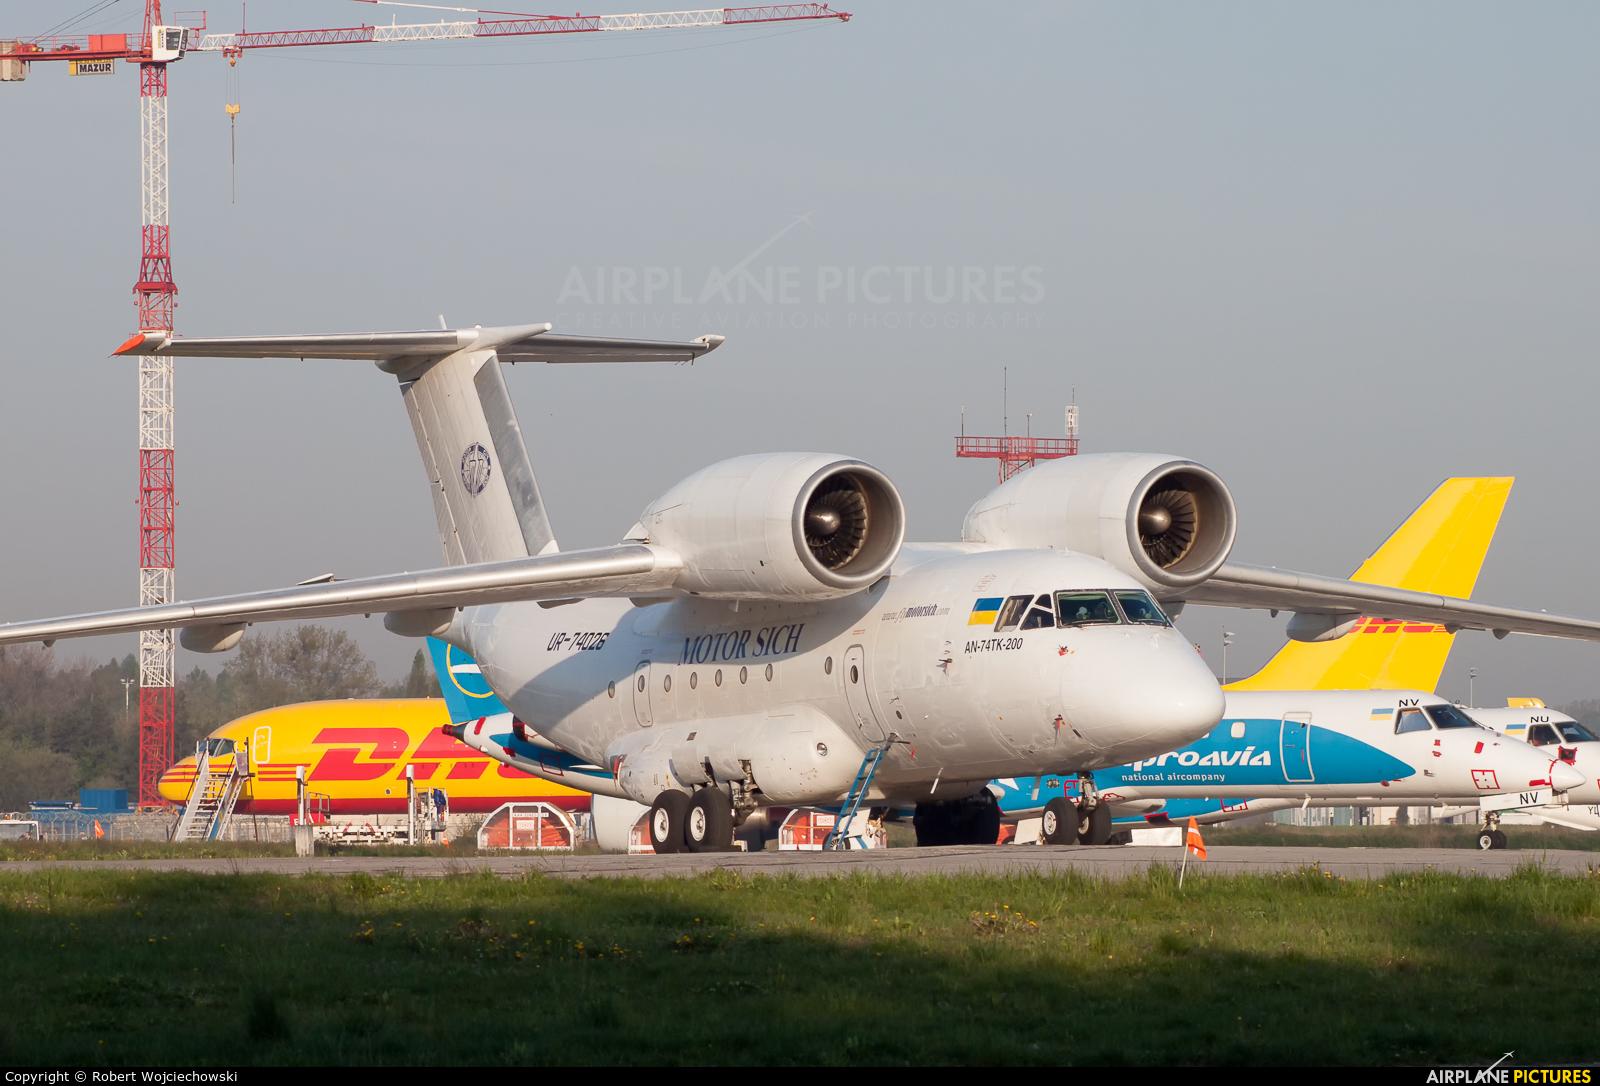 Motor Sich UR-74026 aircraft at Katowice - Pyrzowice